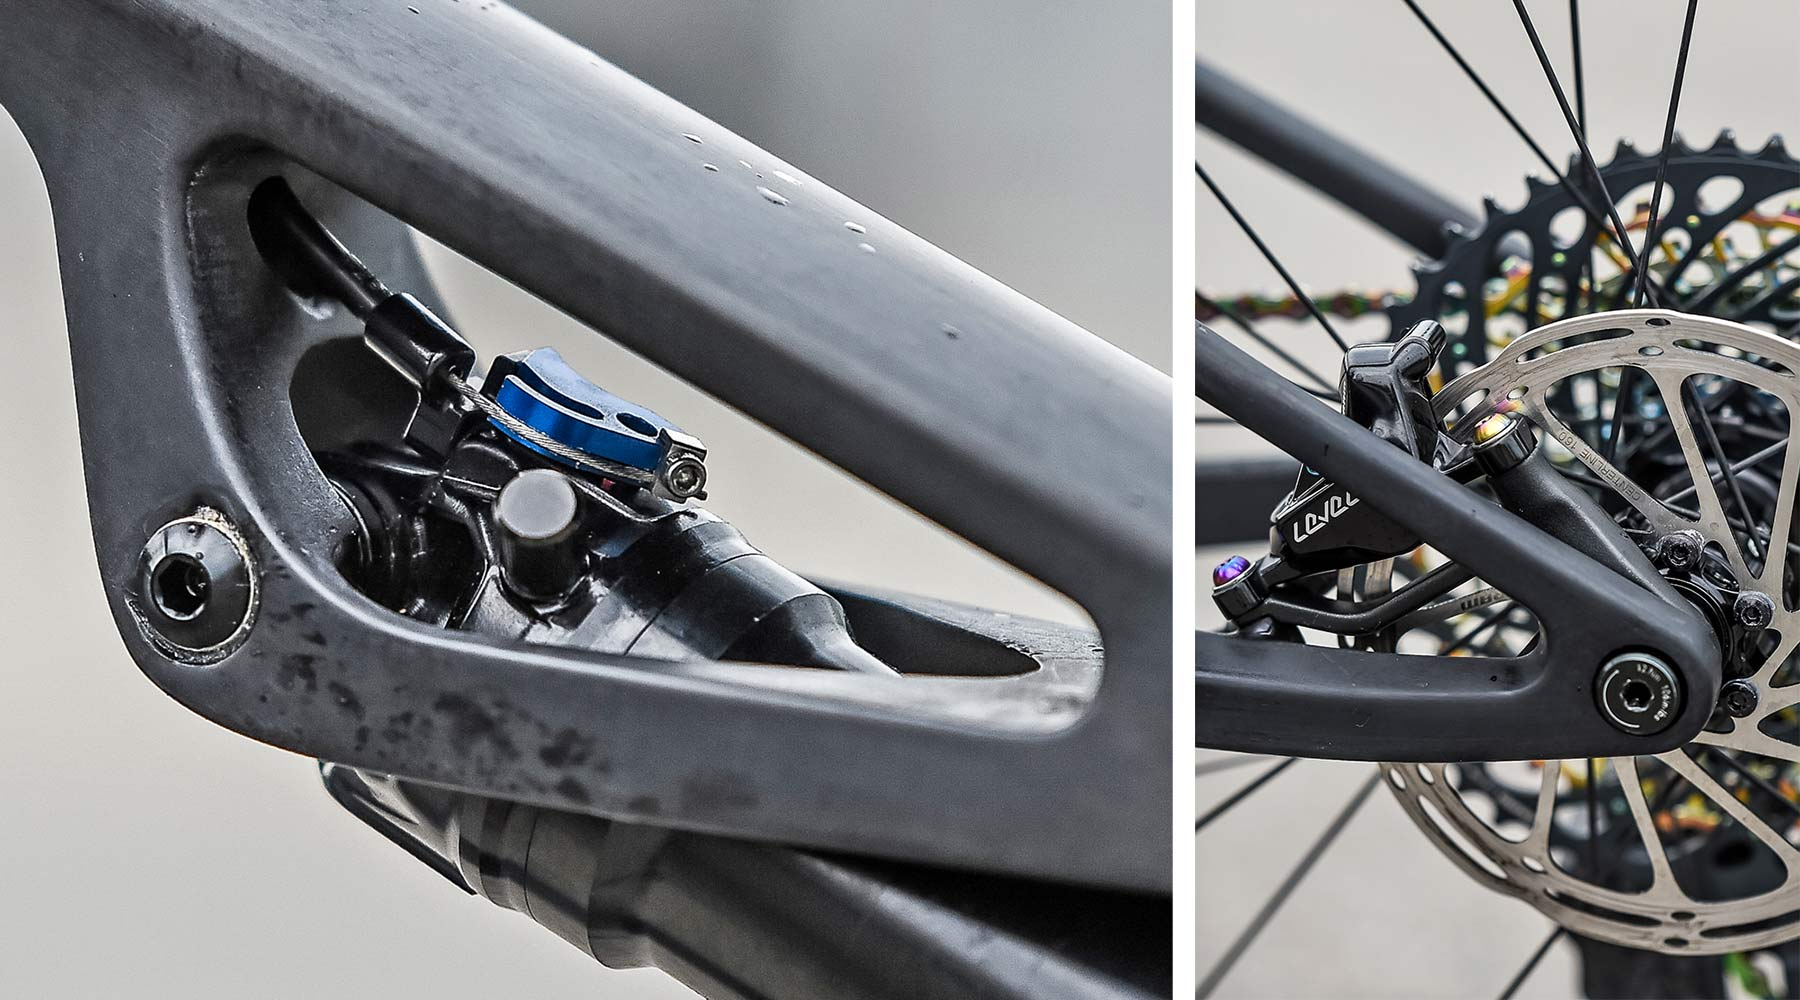 2021 MMR Kenta 29 prototype XC race bike, 100mm full-suspension carbon cross-country mountain bike frame details